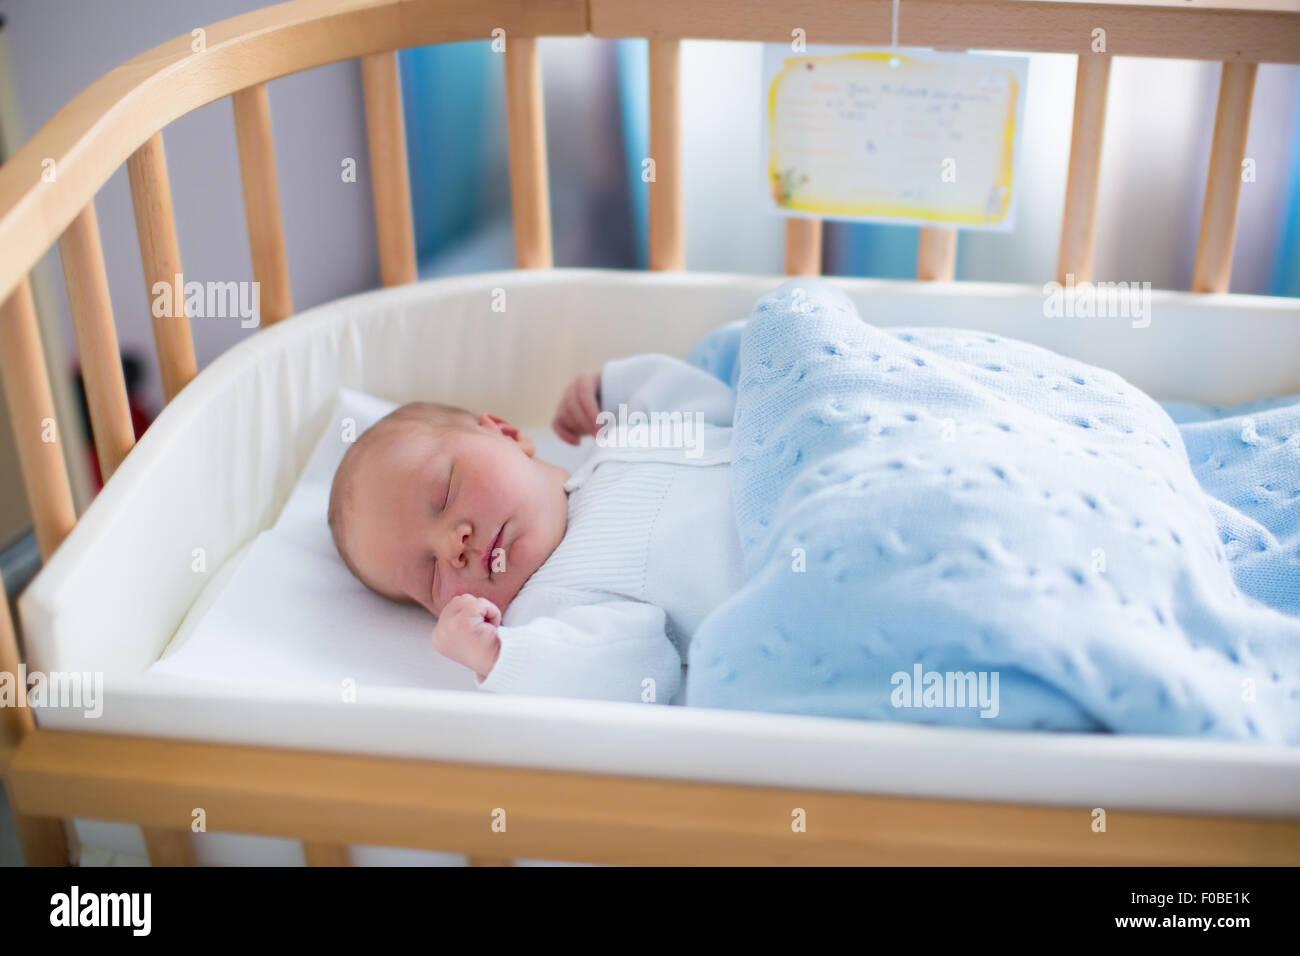 bettwsche baby junge great x baby bettwsche tlg bettset baumwolle escape wei beige with. Black Bedroom Furniture Sets. Home Design Ideas